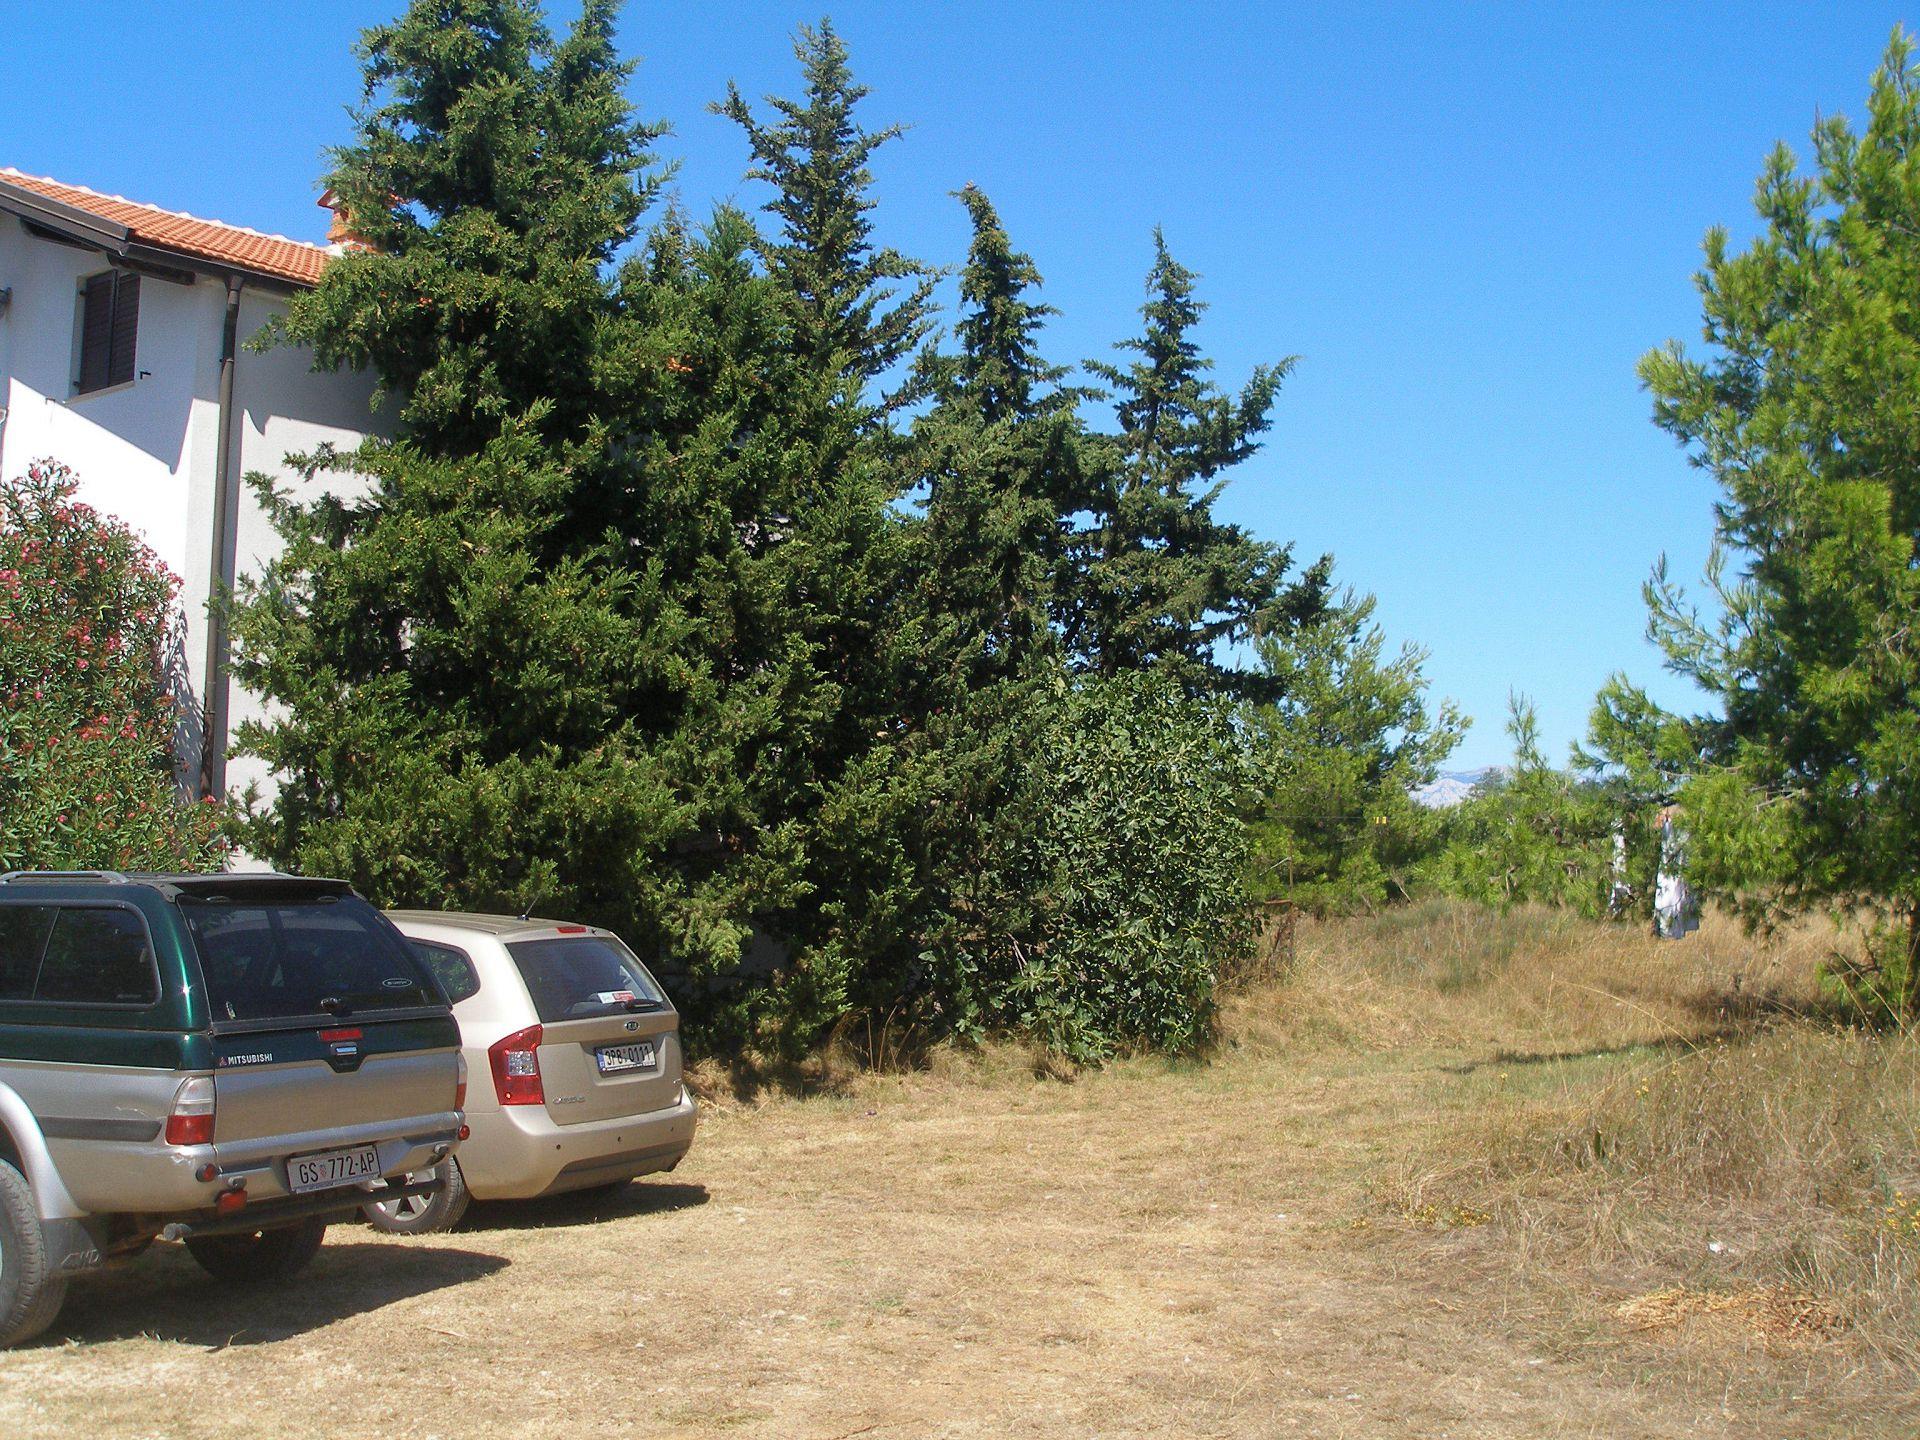 Holiday apartment 001PRIV A1(4+2) - Privlaka (742036), Privlaka, , Dalmatia, Croatia, picture 2